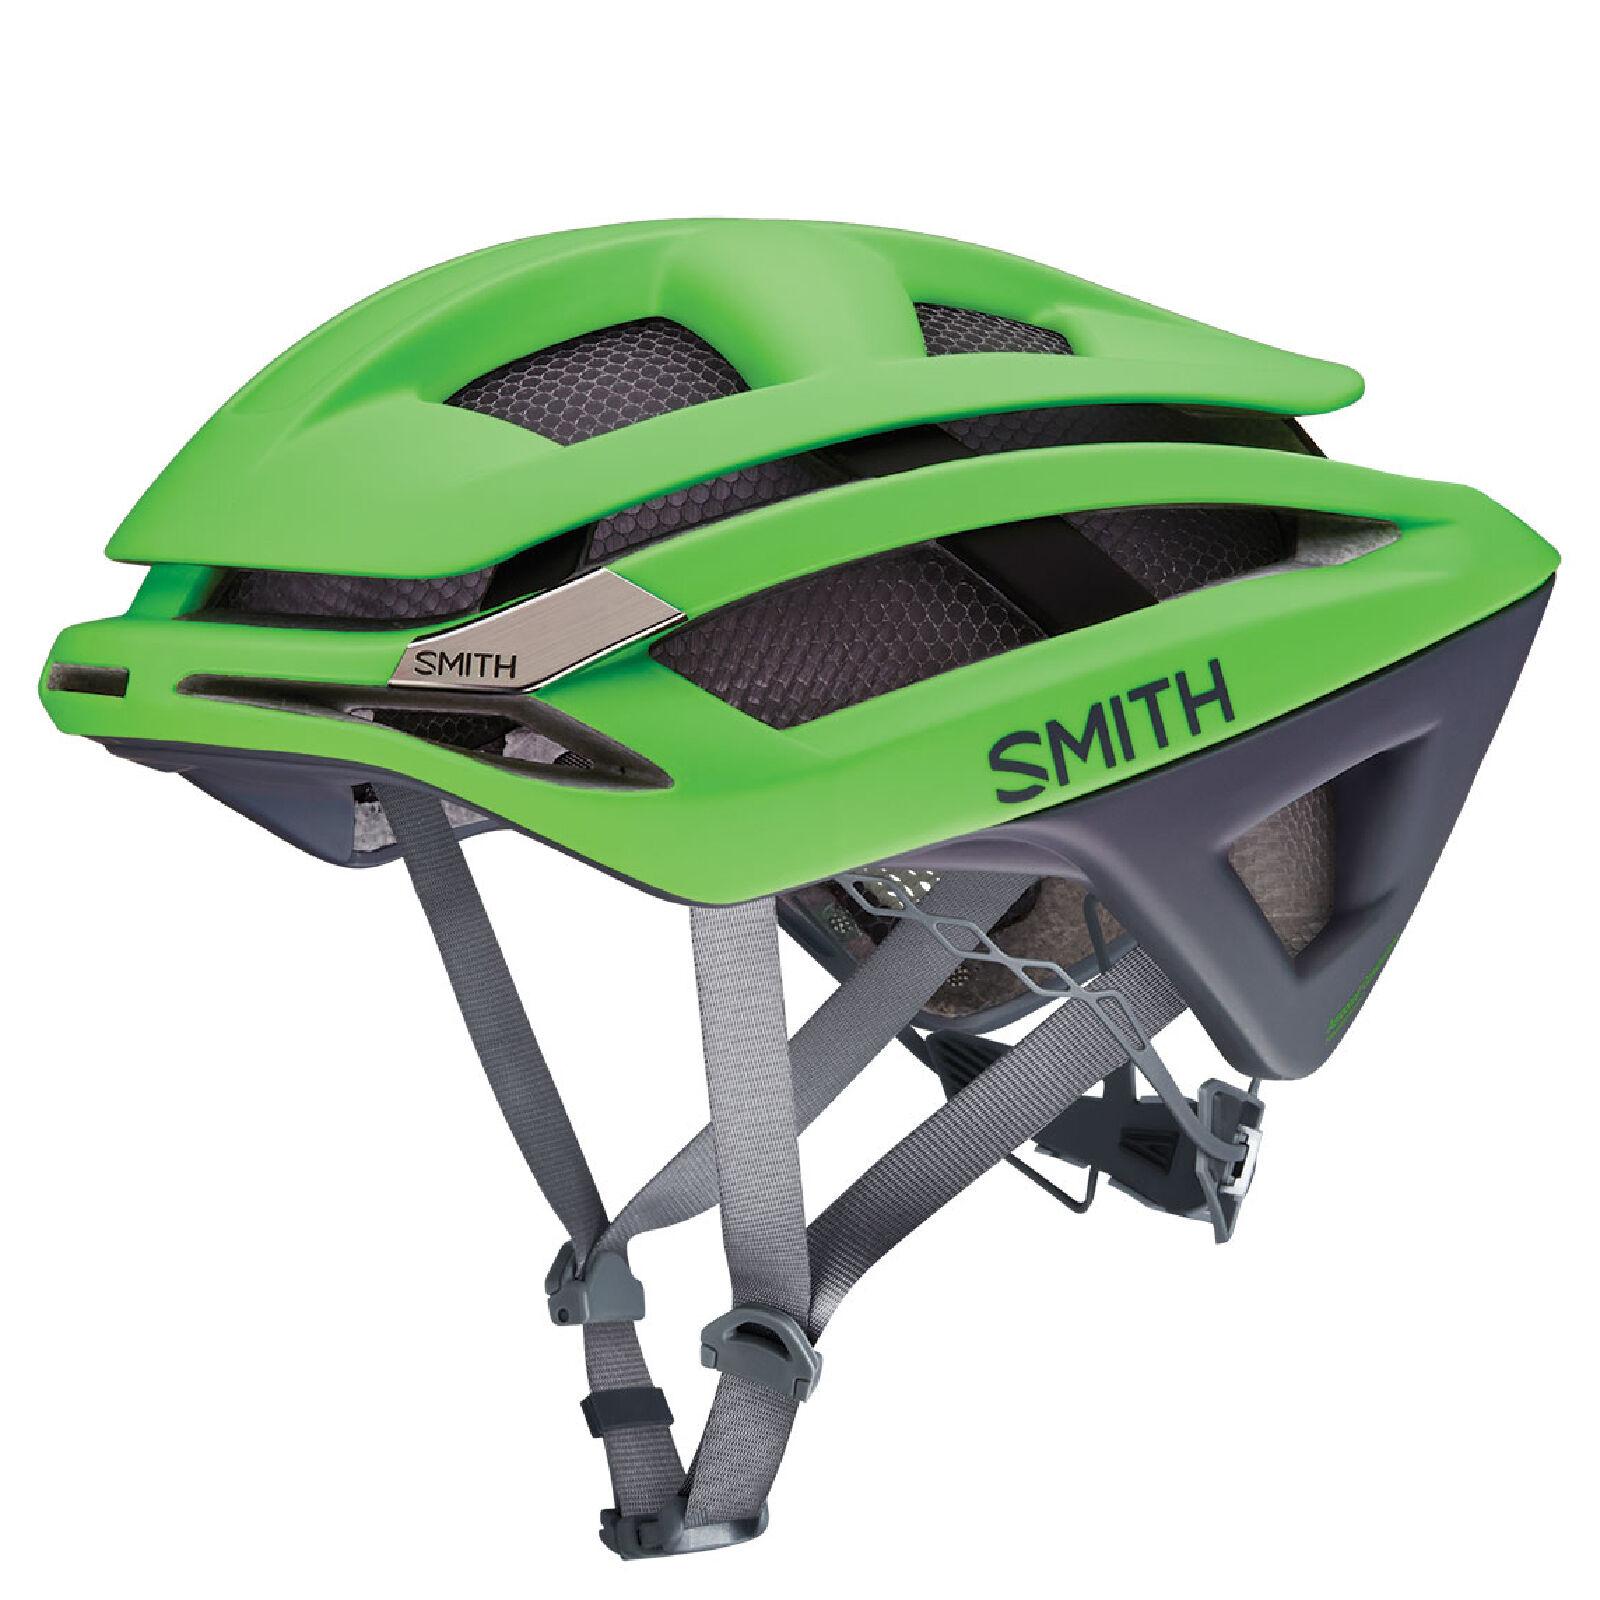 Smith Overtake Bicycle Helmet - S/51-55cm - Green/Black